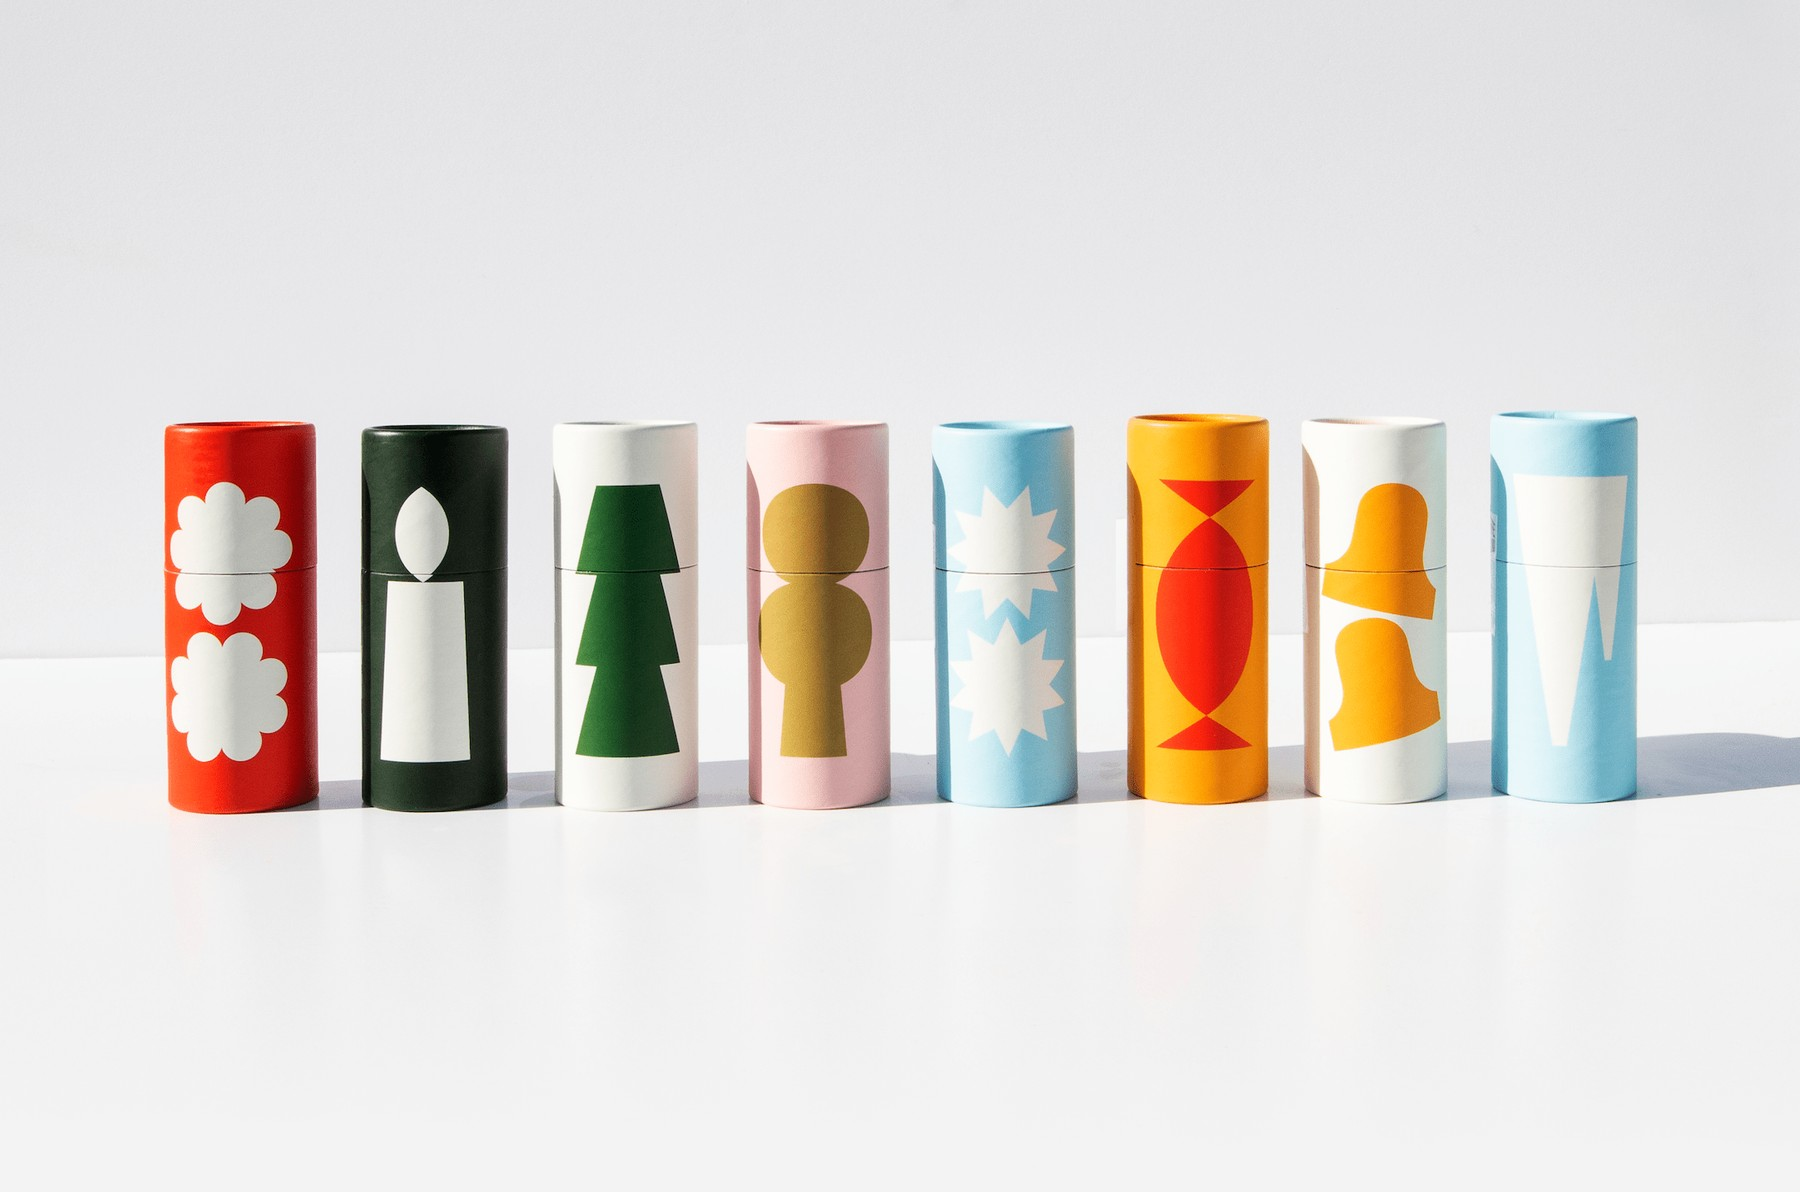 kaffebox-packaging-design.jpg.png?fit=2174-1440-ssl=1